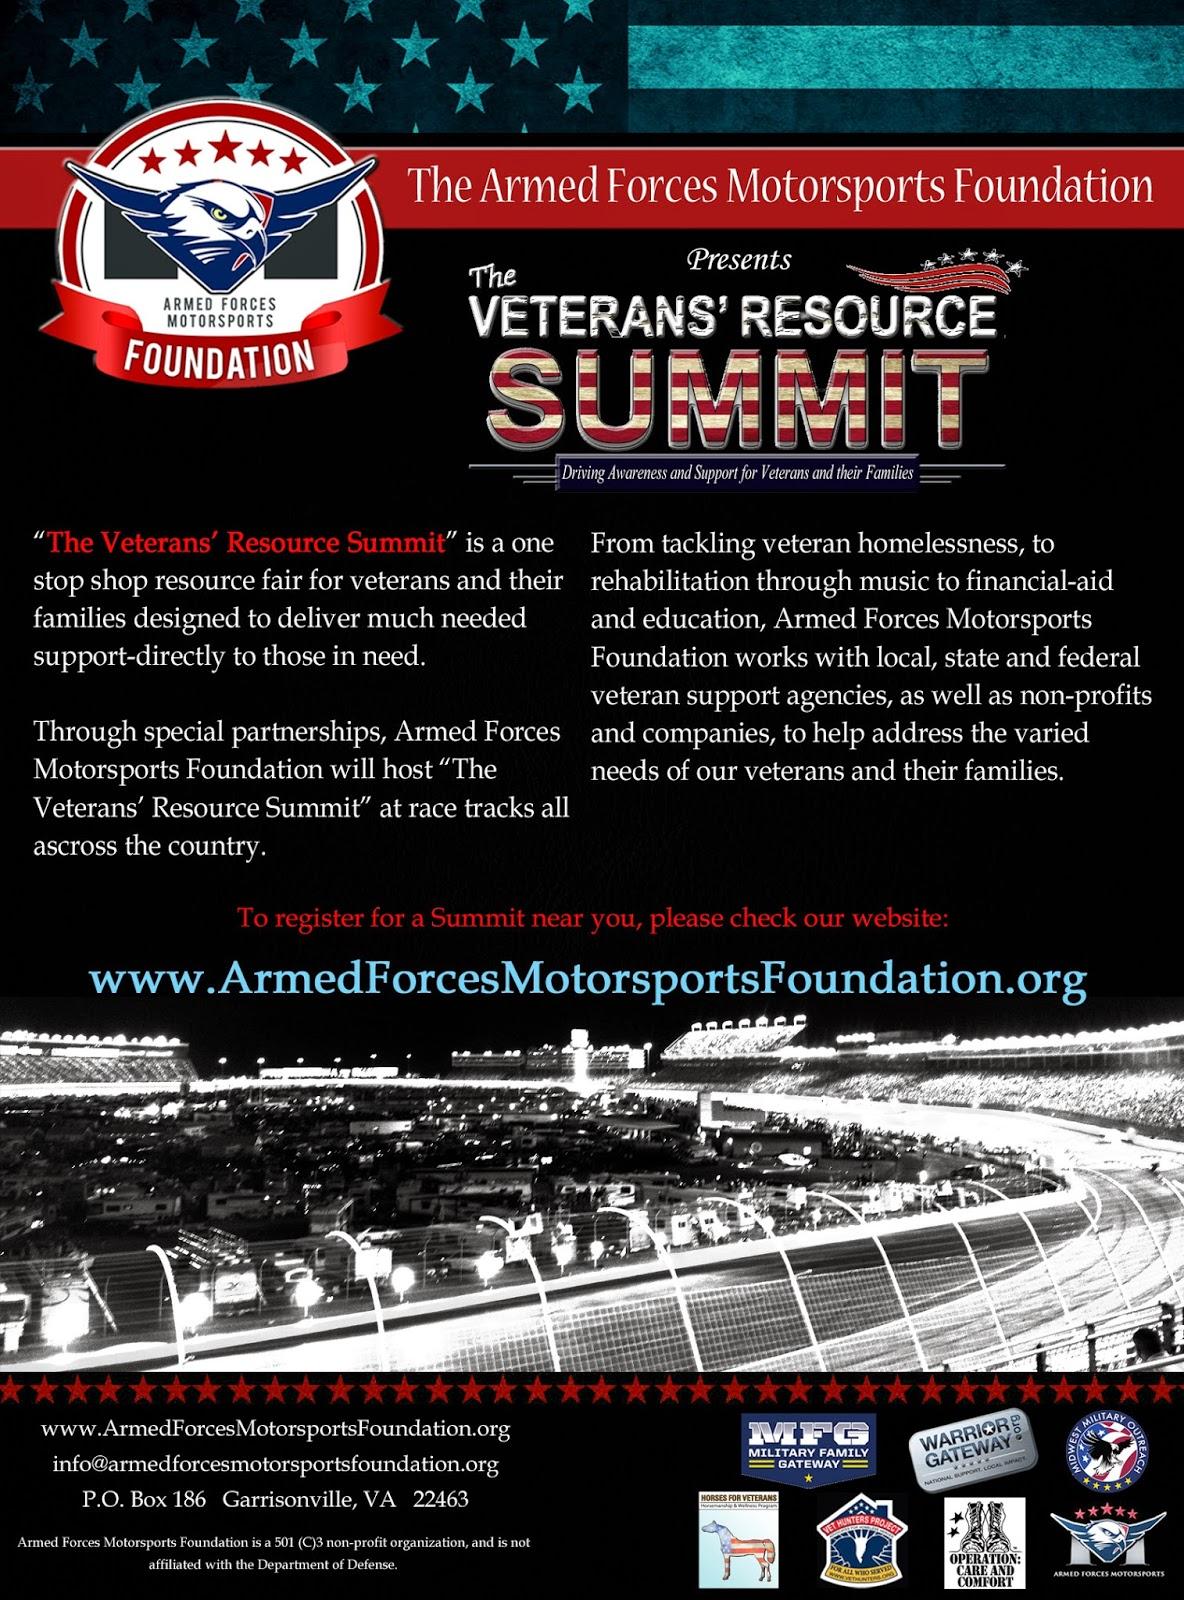 www.armedforcesmotorsports.com